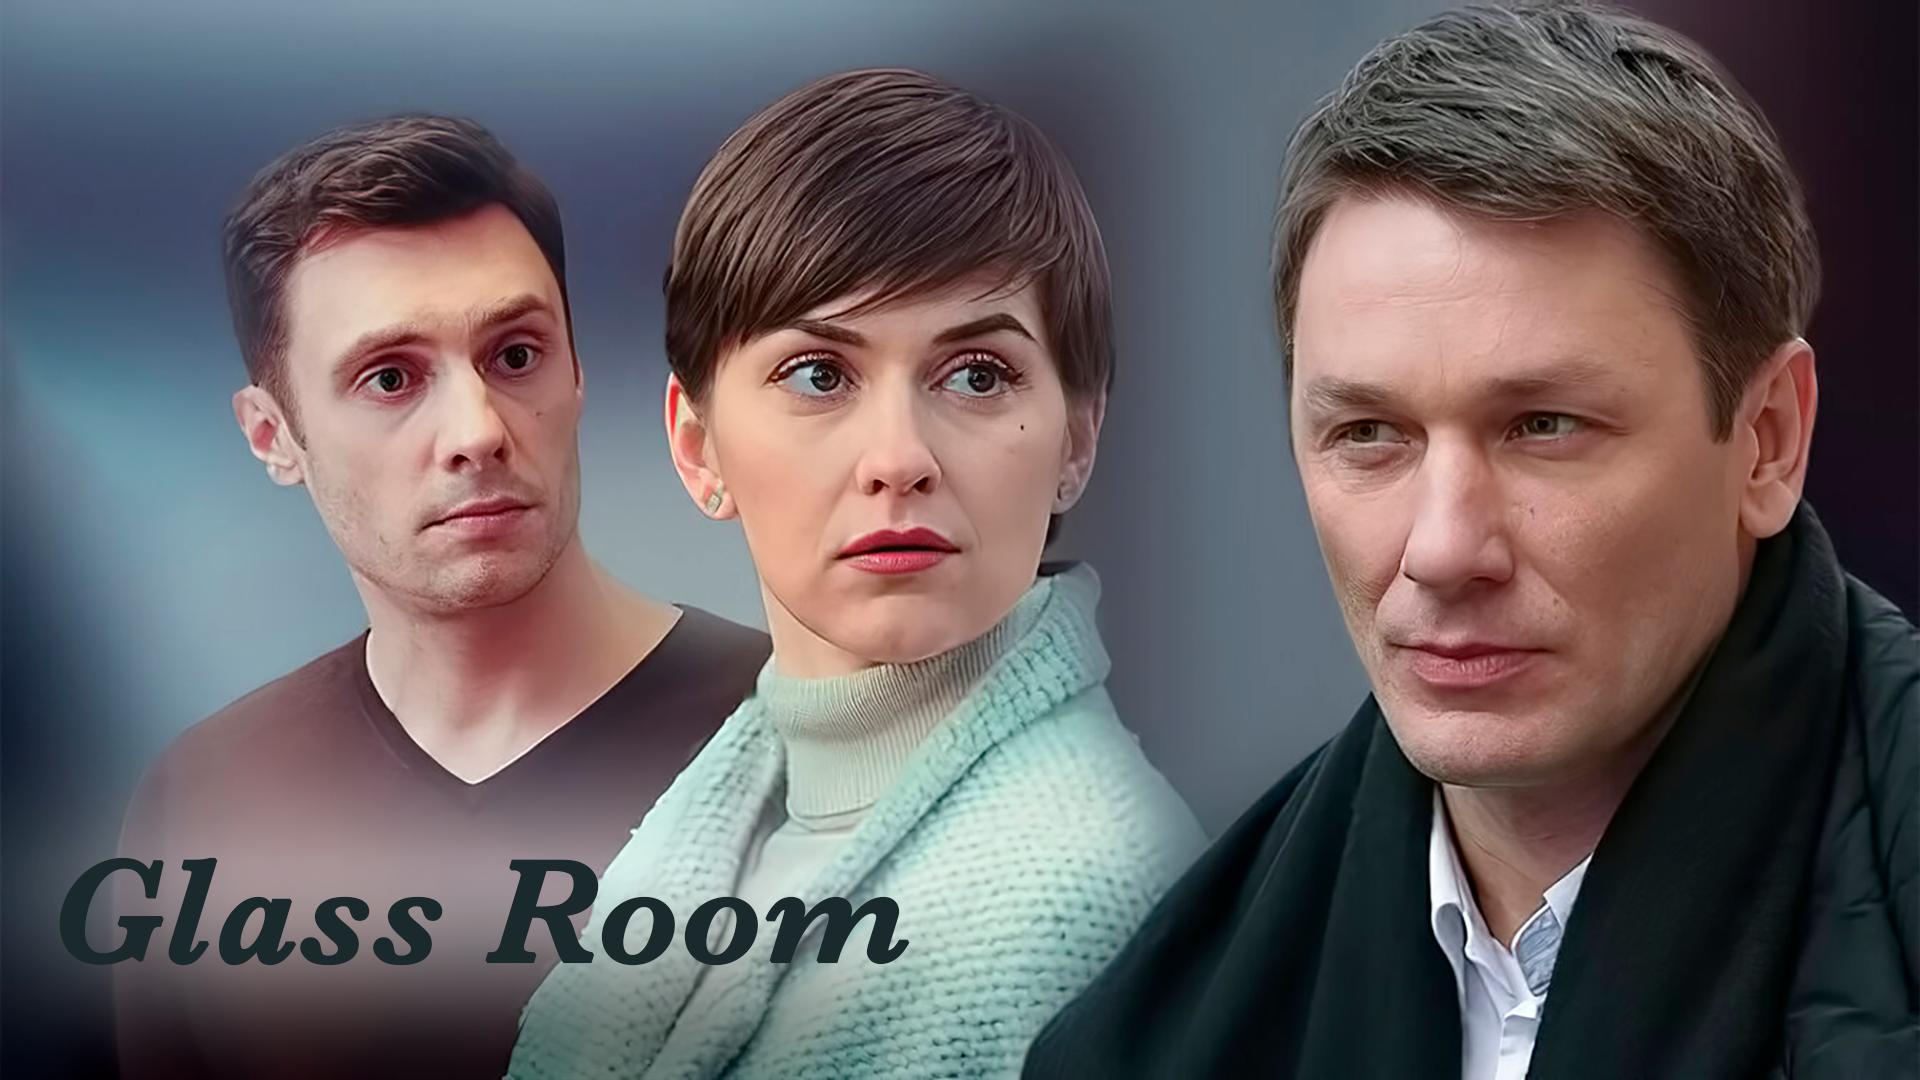 Glass Room on Amazon Prime Video UK